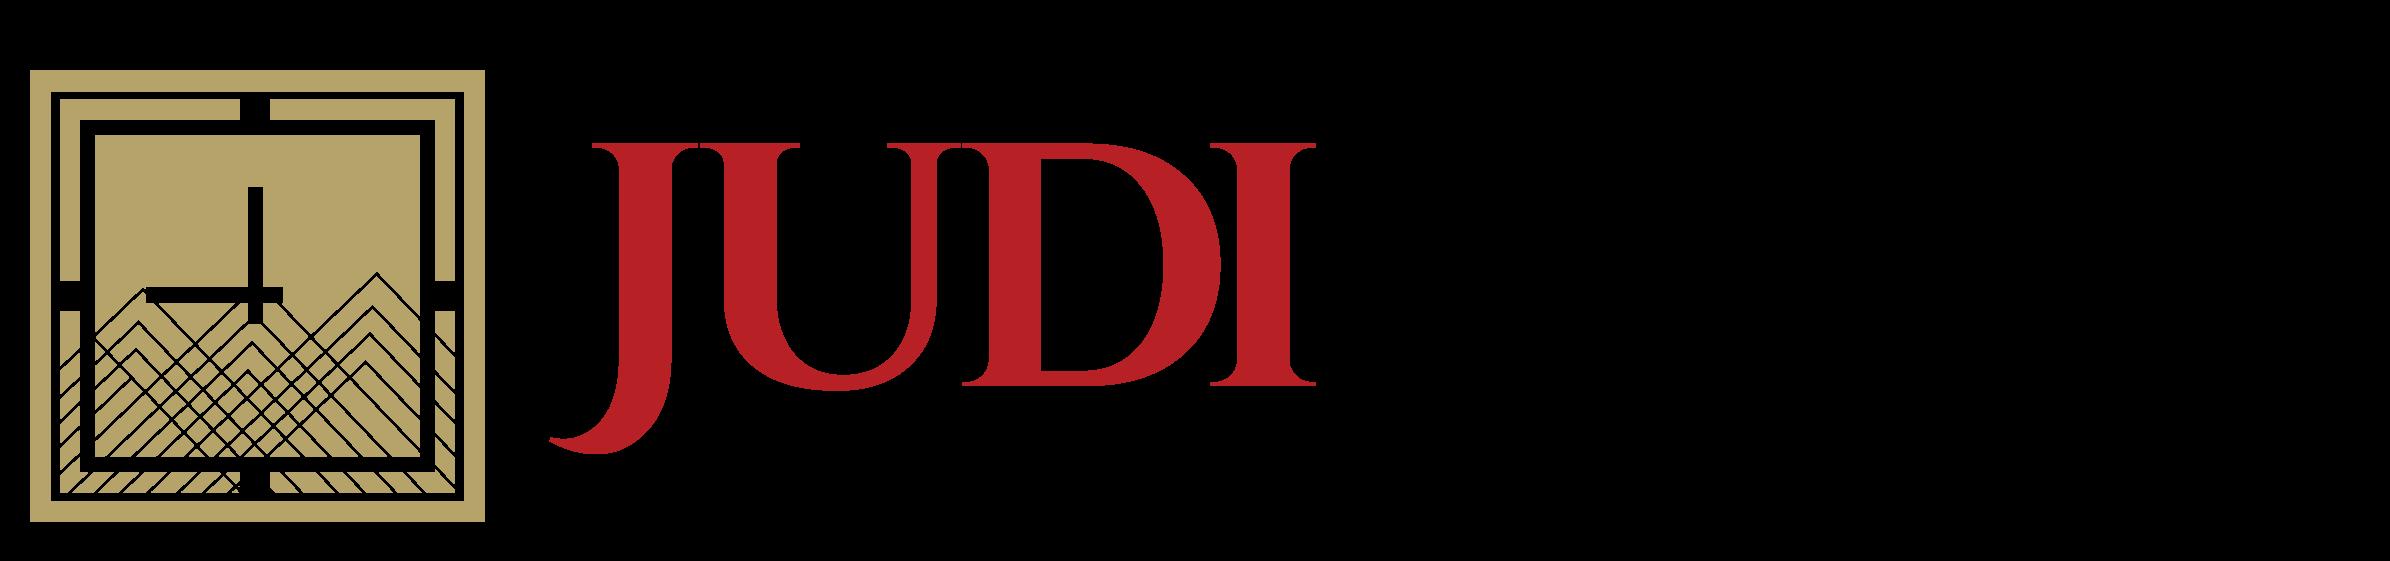 Judi Goods